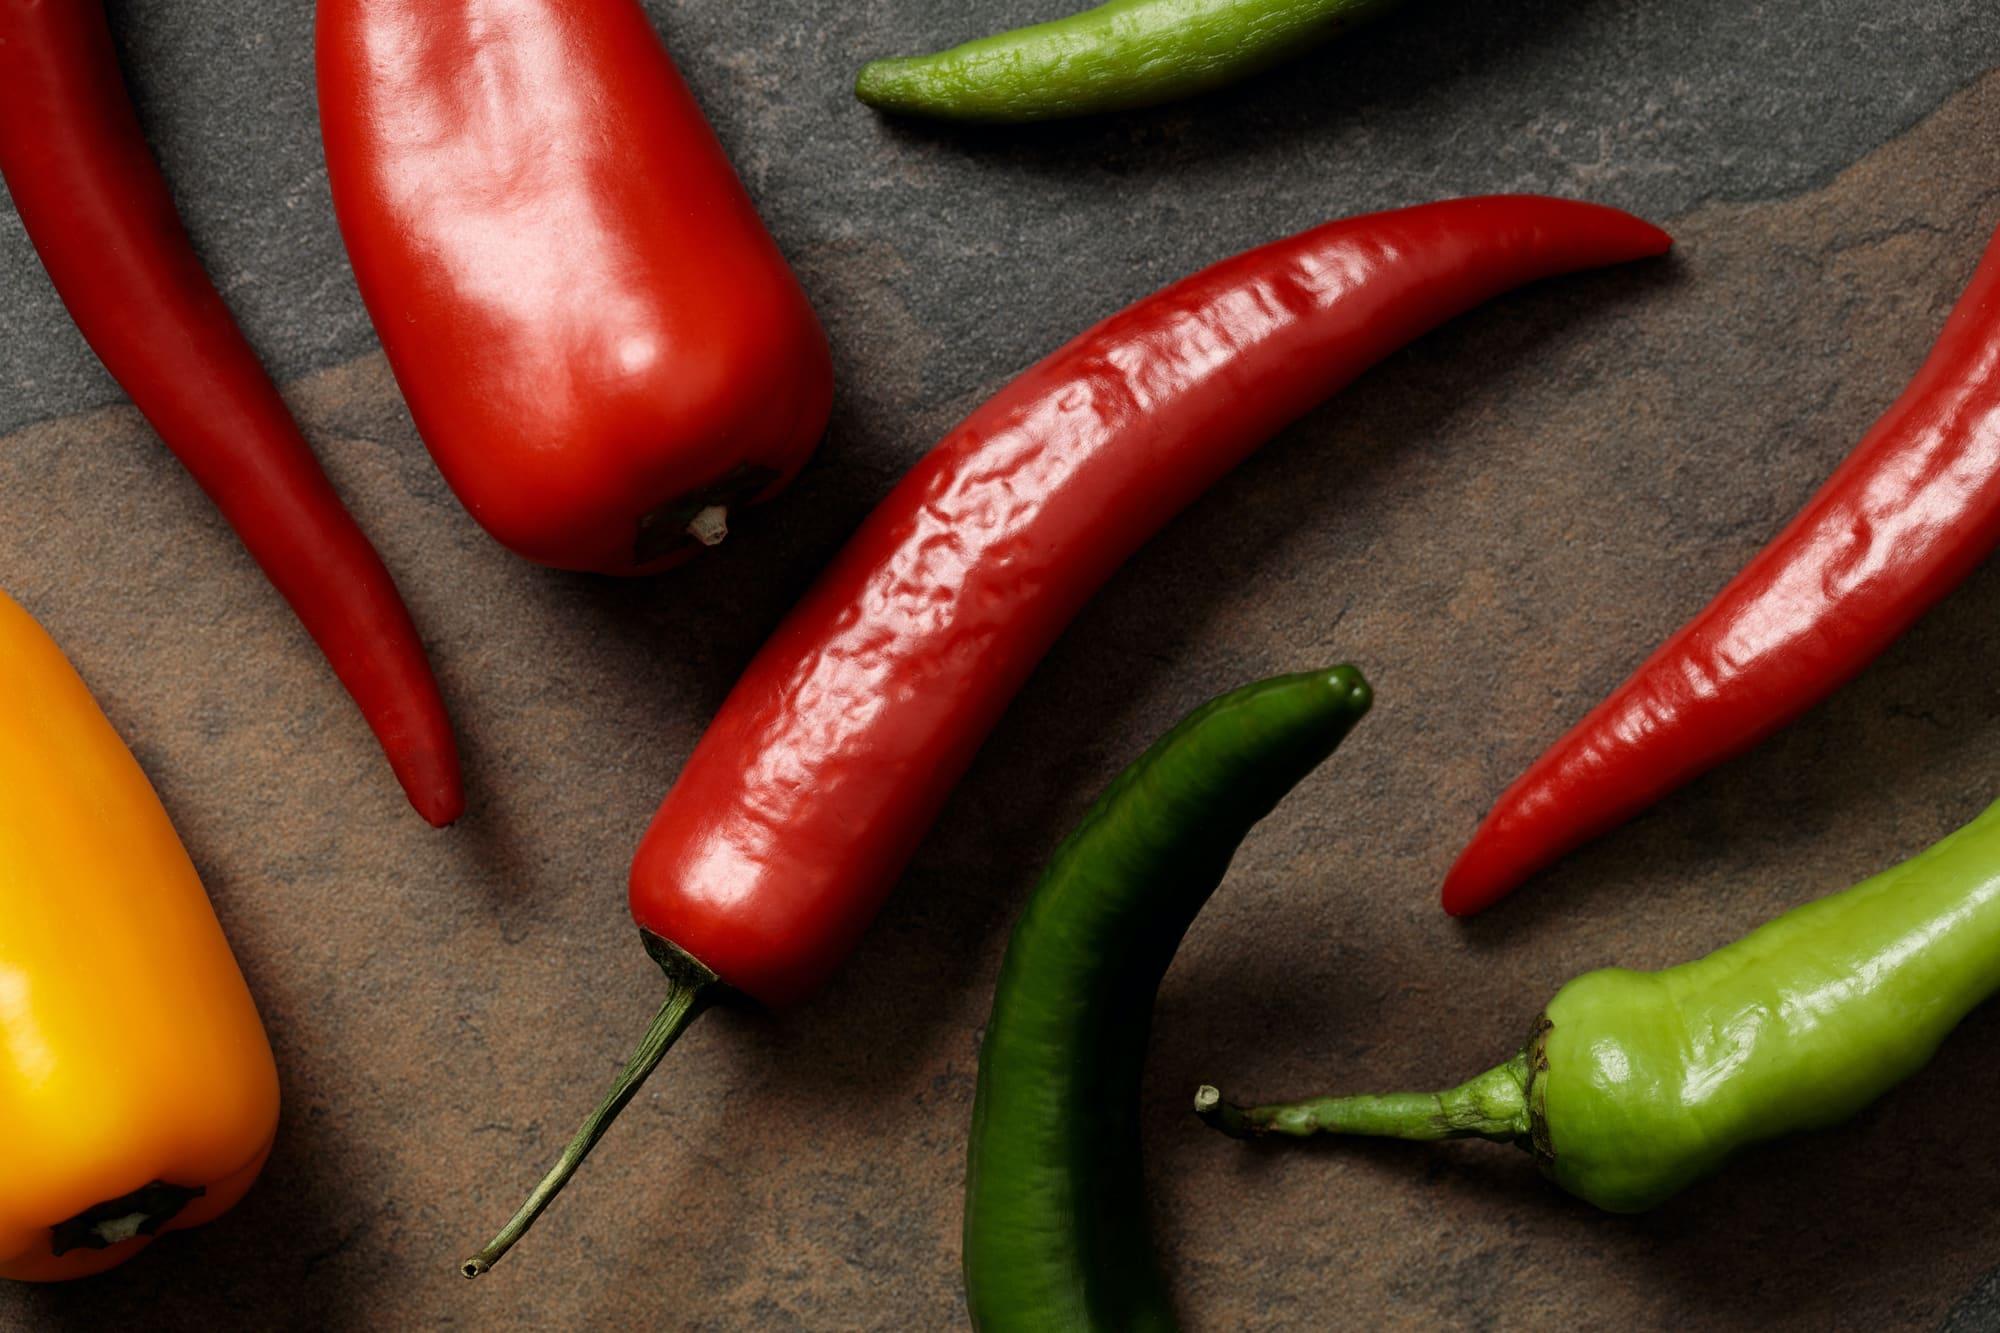 Vitamins in Peppers